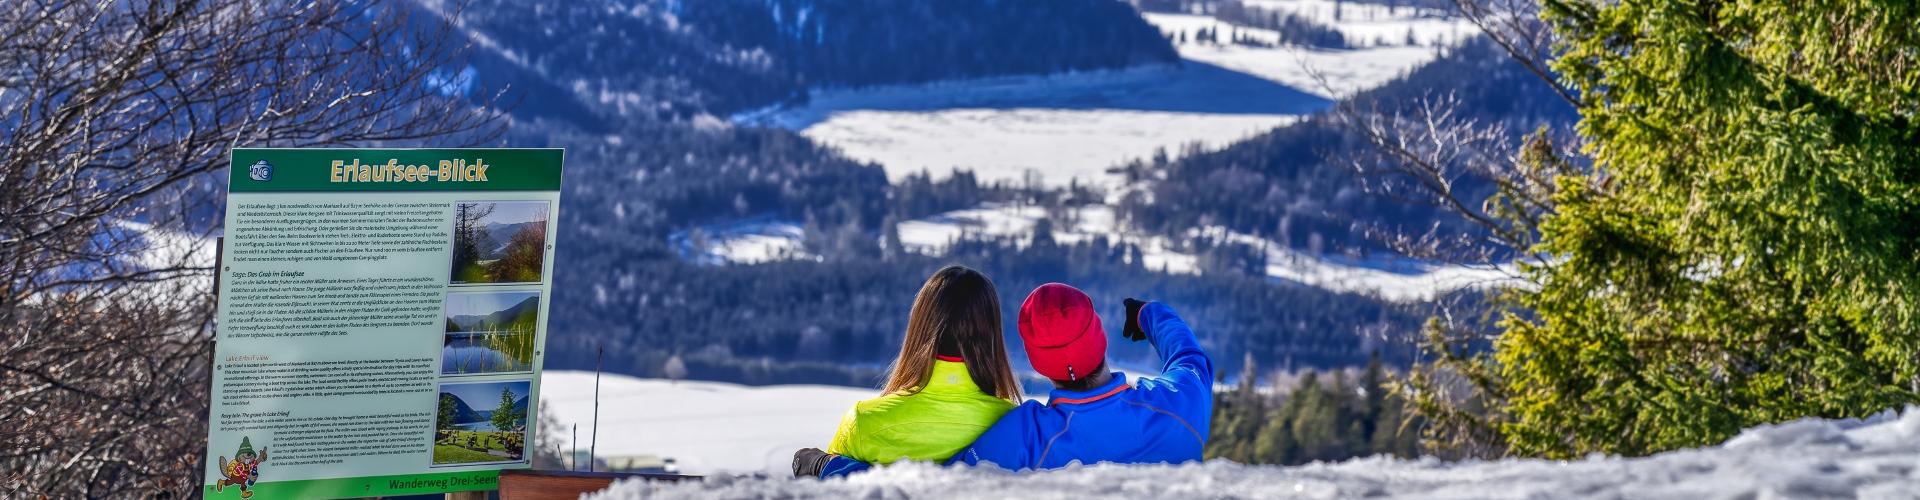 Schneeschuhwandern, © Mariazeller Bürgeralpe/Dellinger